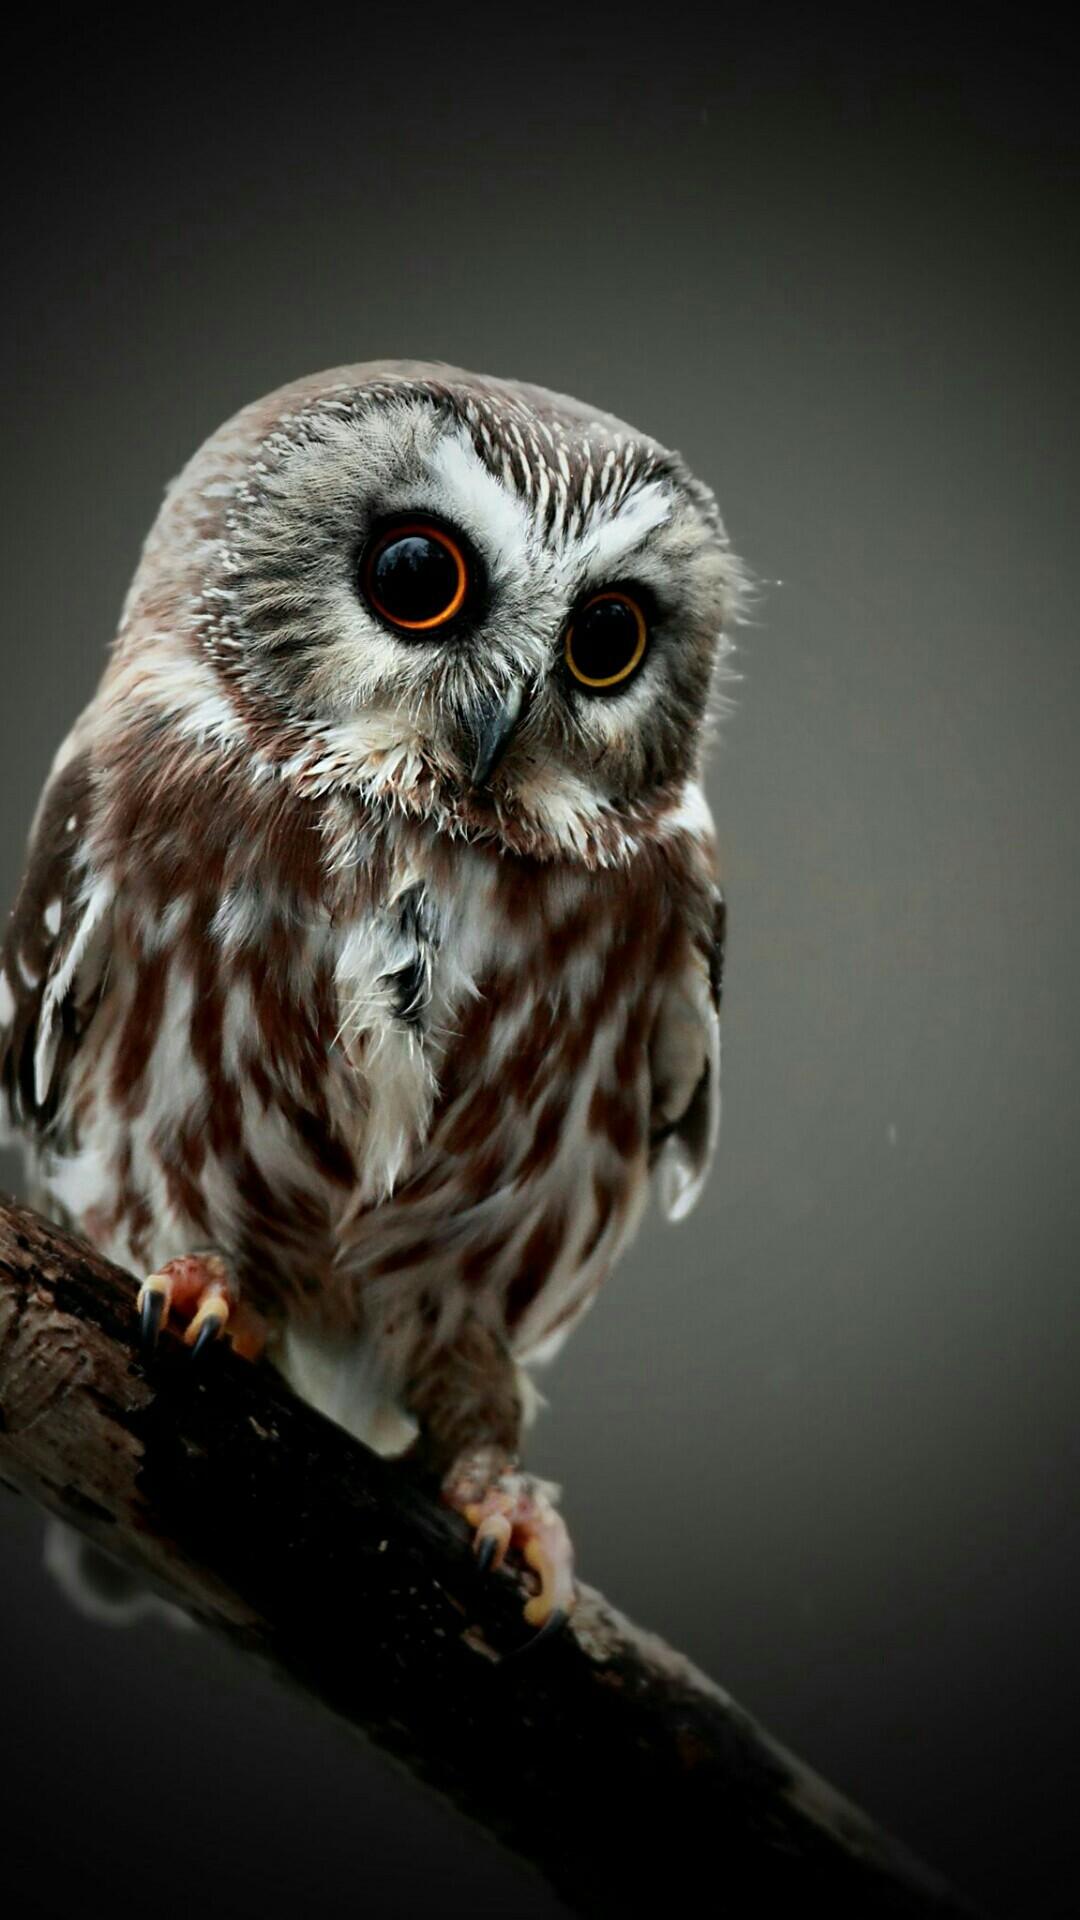 A Cute Owl Mobile HD Wallpaper